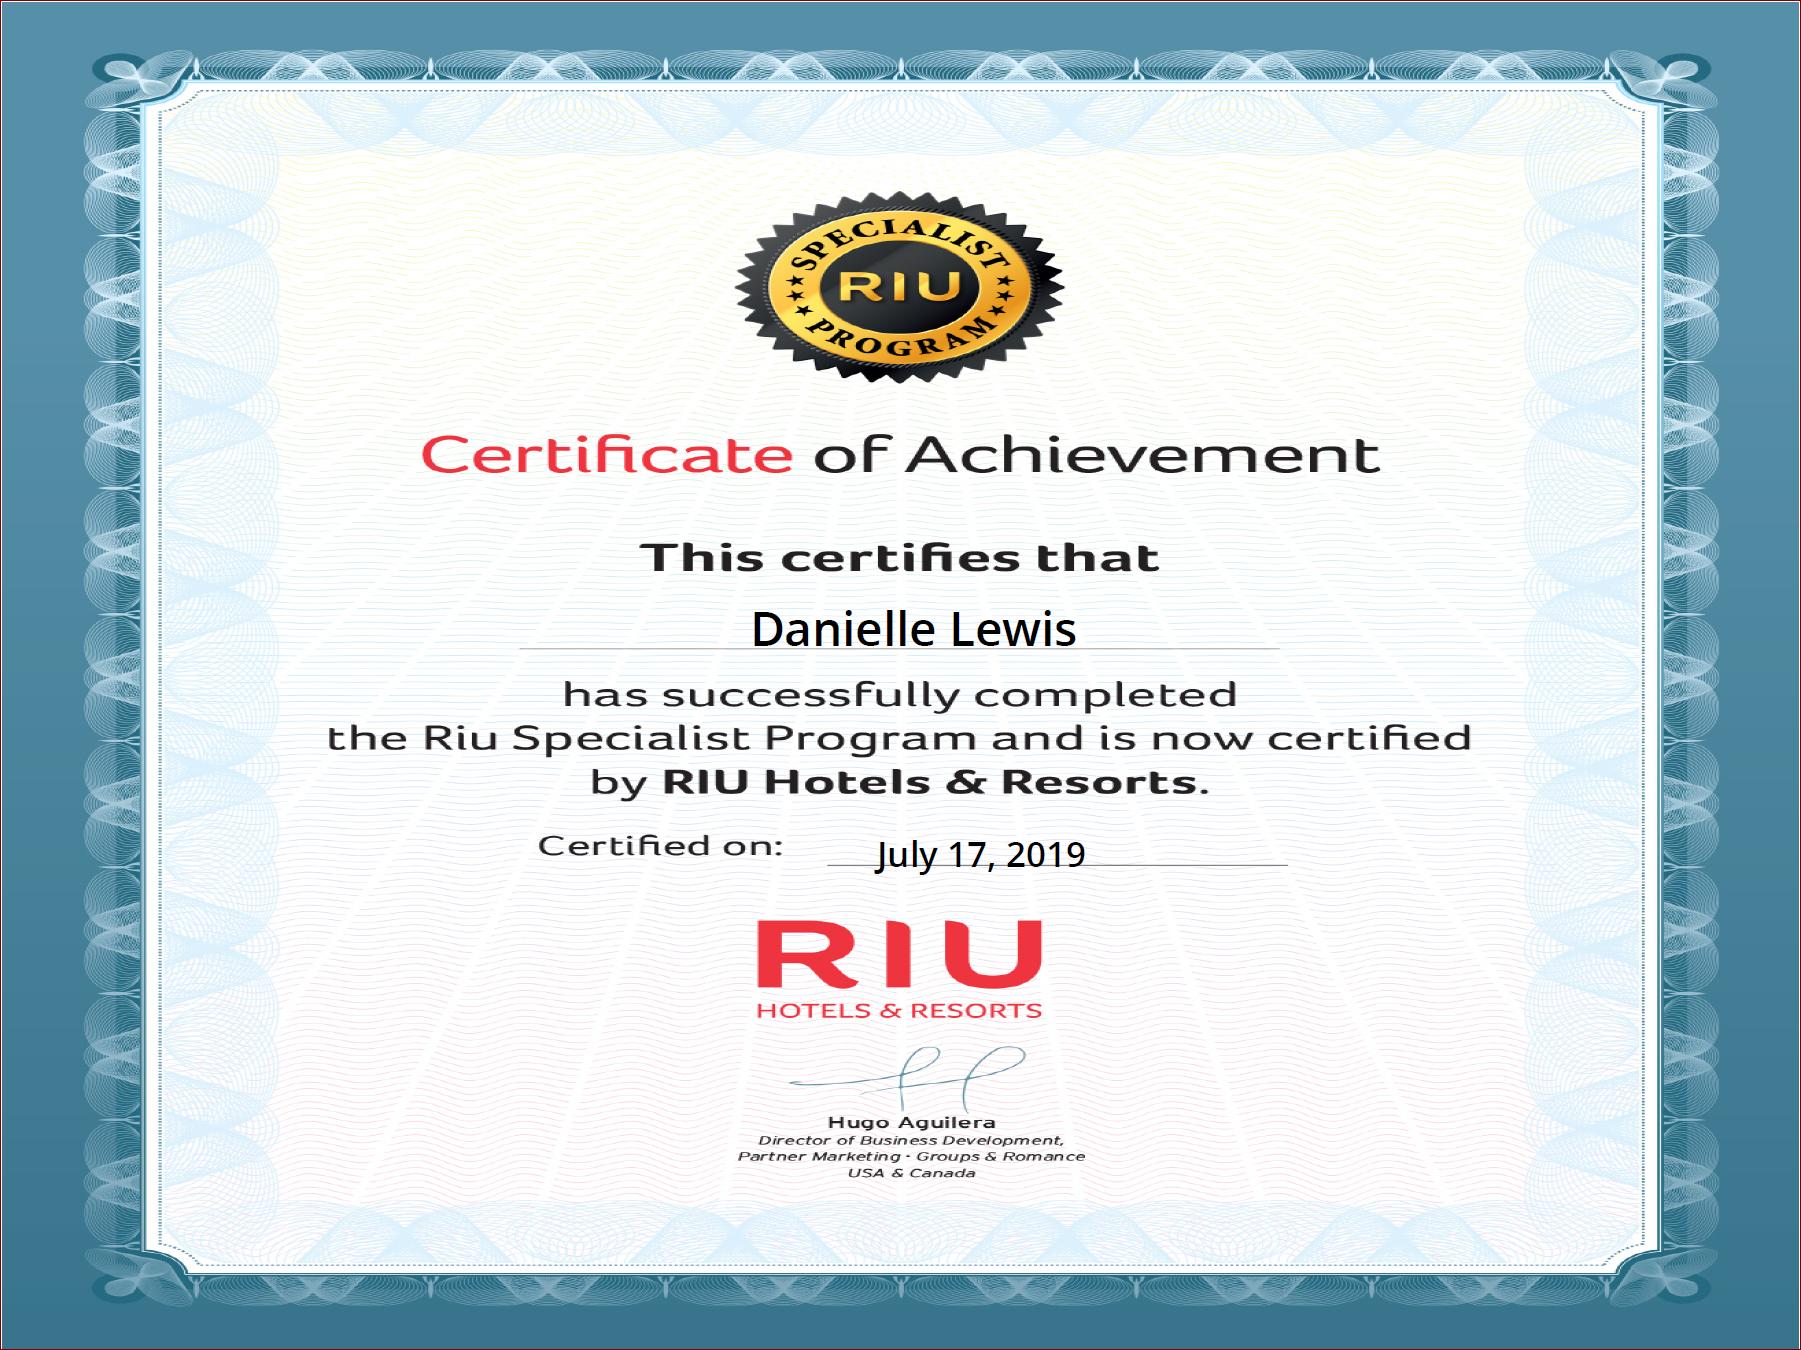 SelfishMe Travel - Riu Hotels & Resorts Specialist Certificate of Achievement